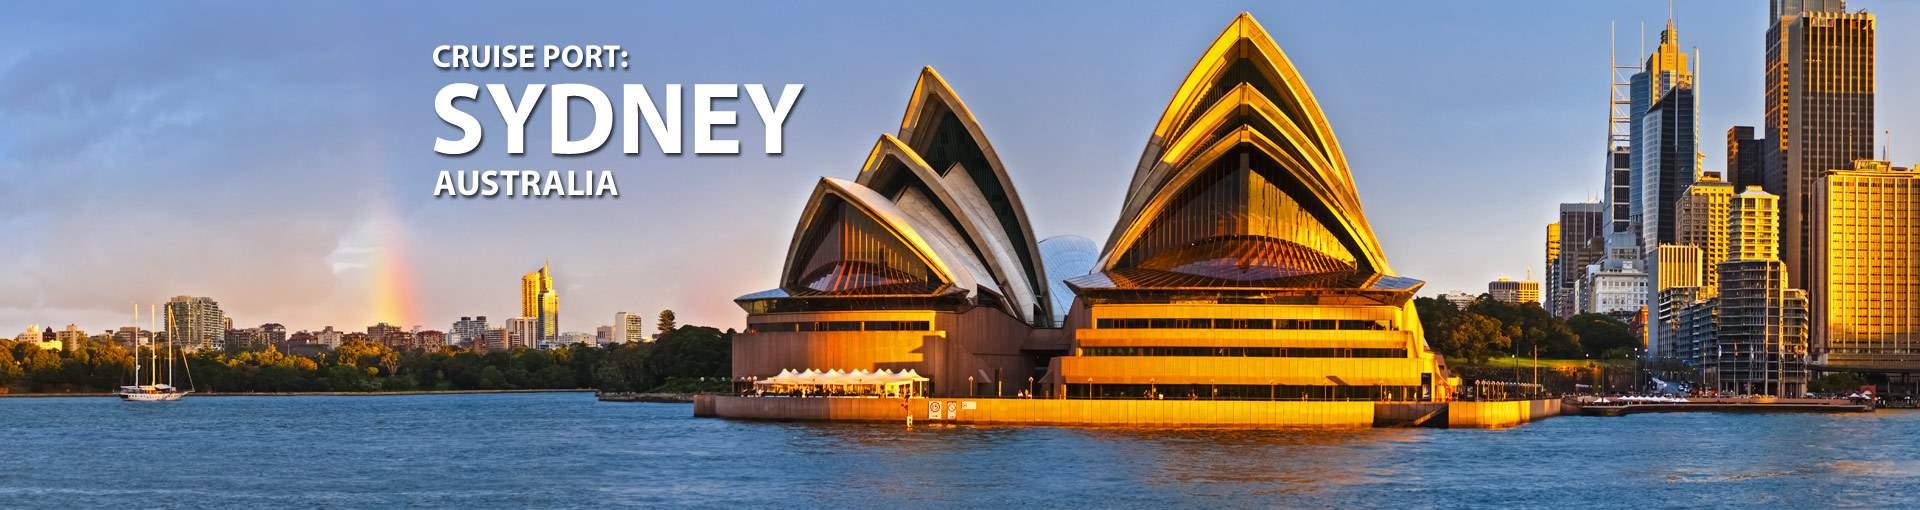 Cruises from Sydney, Australia